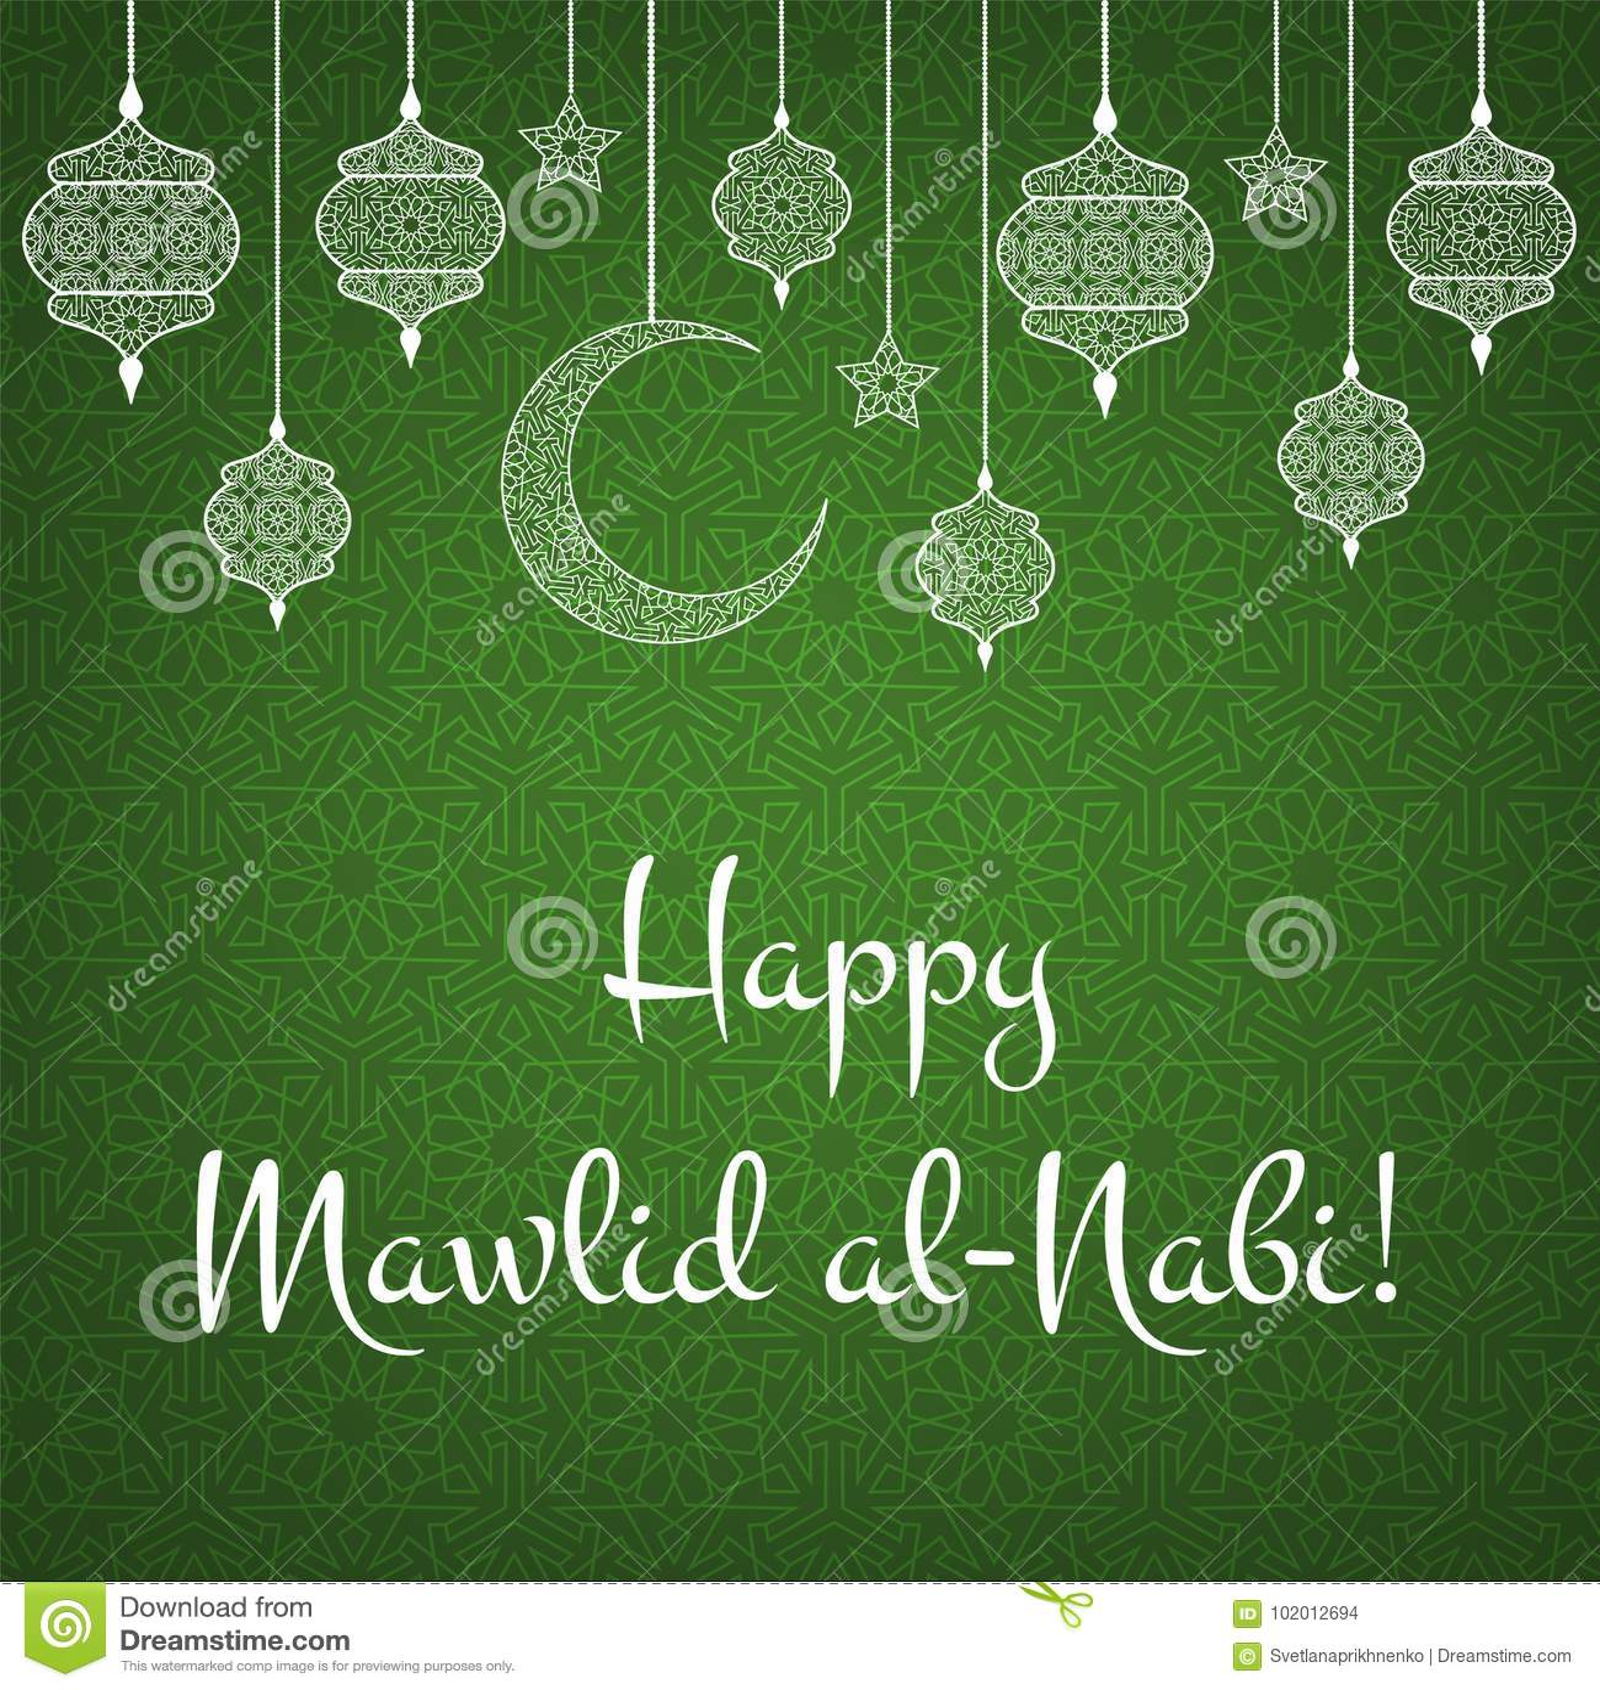 Mawlid Al Nabi Stock Vector Illustration Of Allah Kareem 102012694